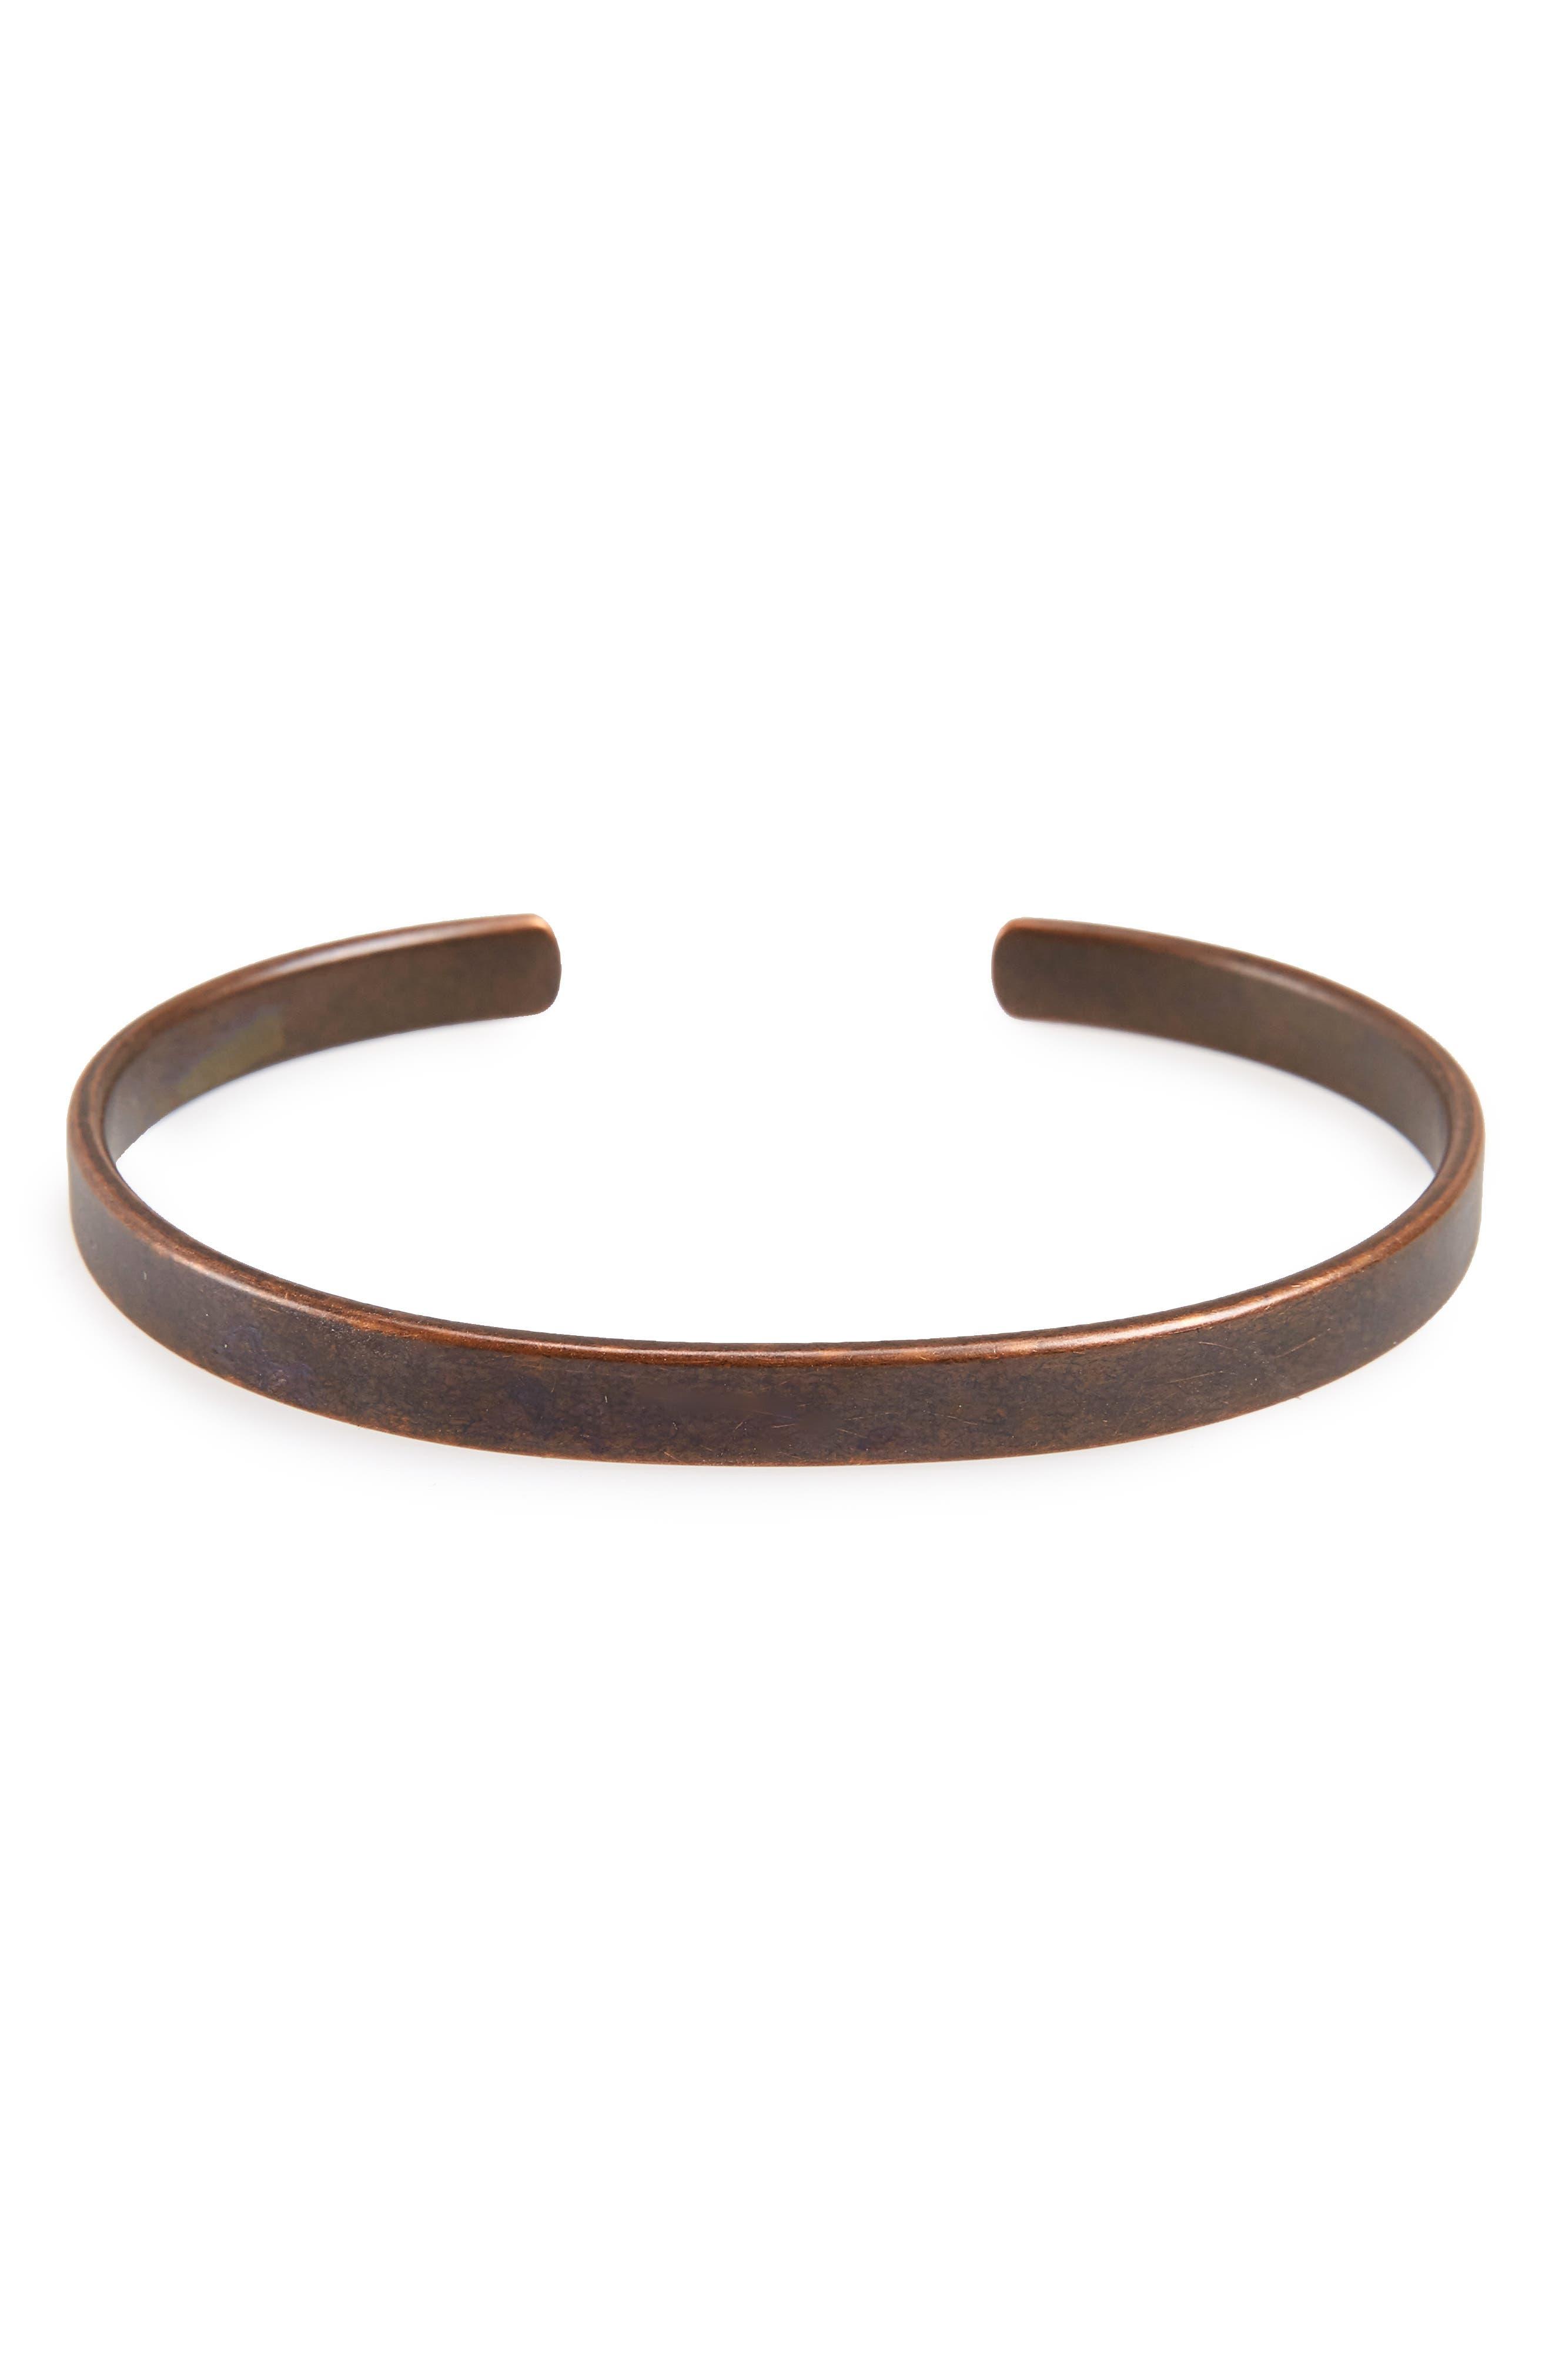 Alternate Image 1 Selected - Caputo & Co. Metal Cuff Bracelet